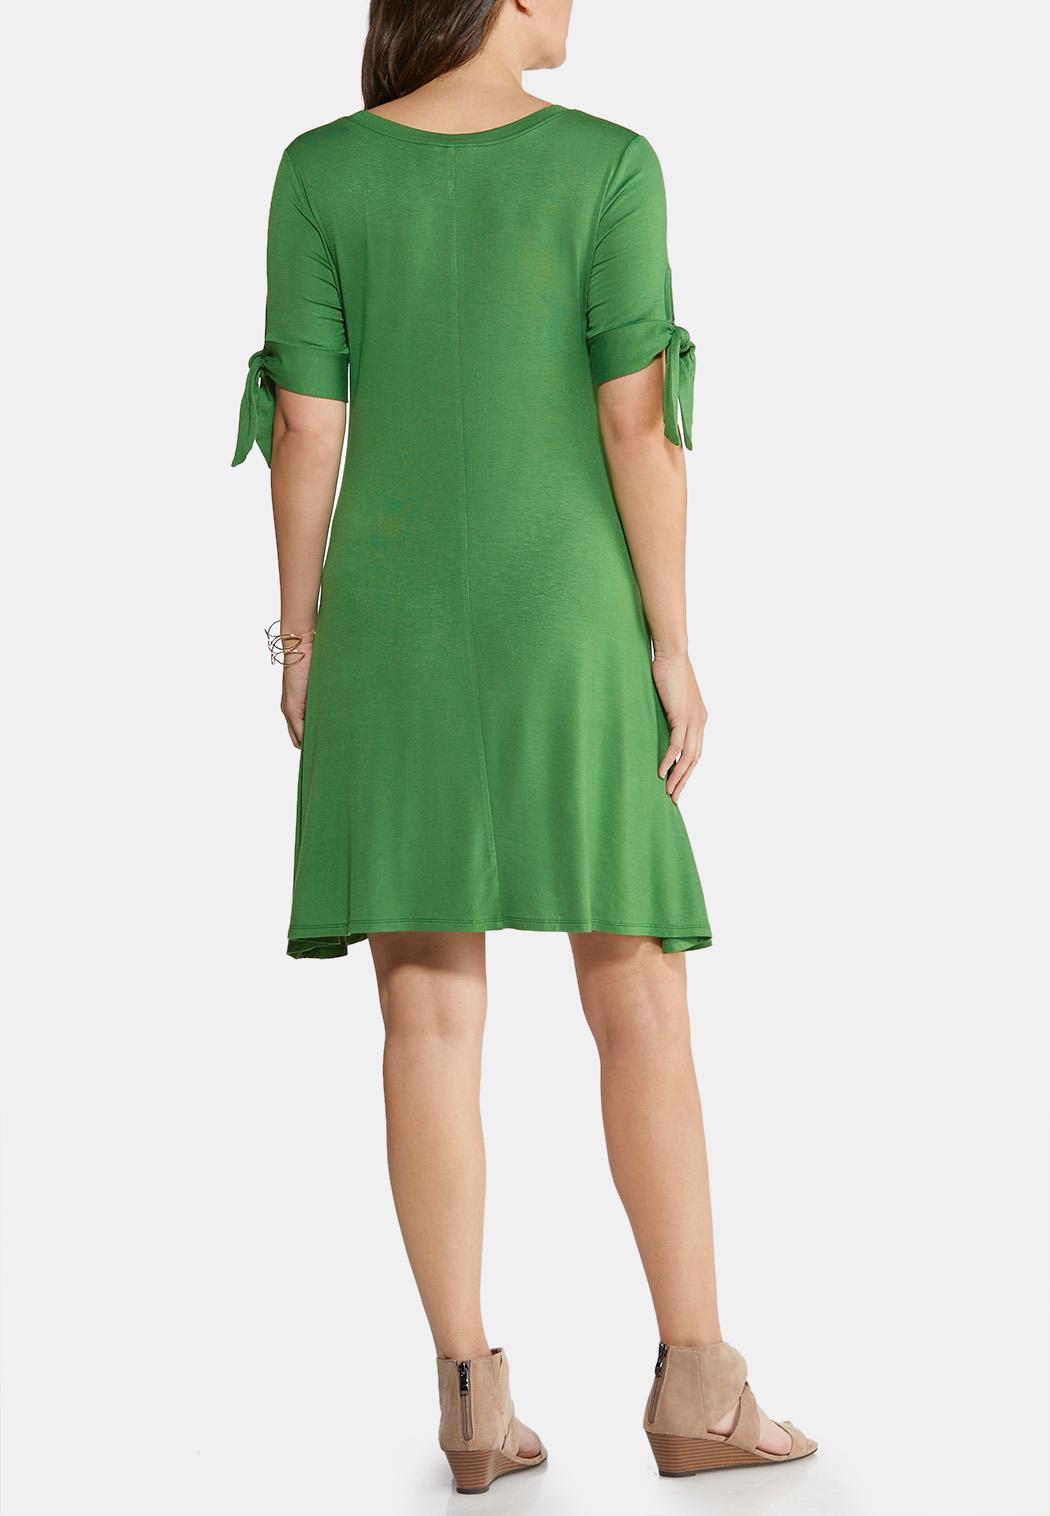 07cdf8251bca Plus Size Bow Sleeve Swing Dress Summer Dresses Cato Fashions